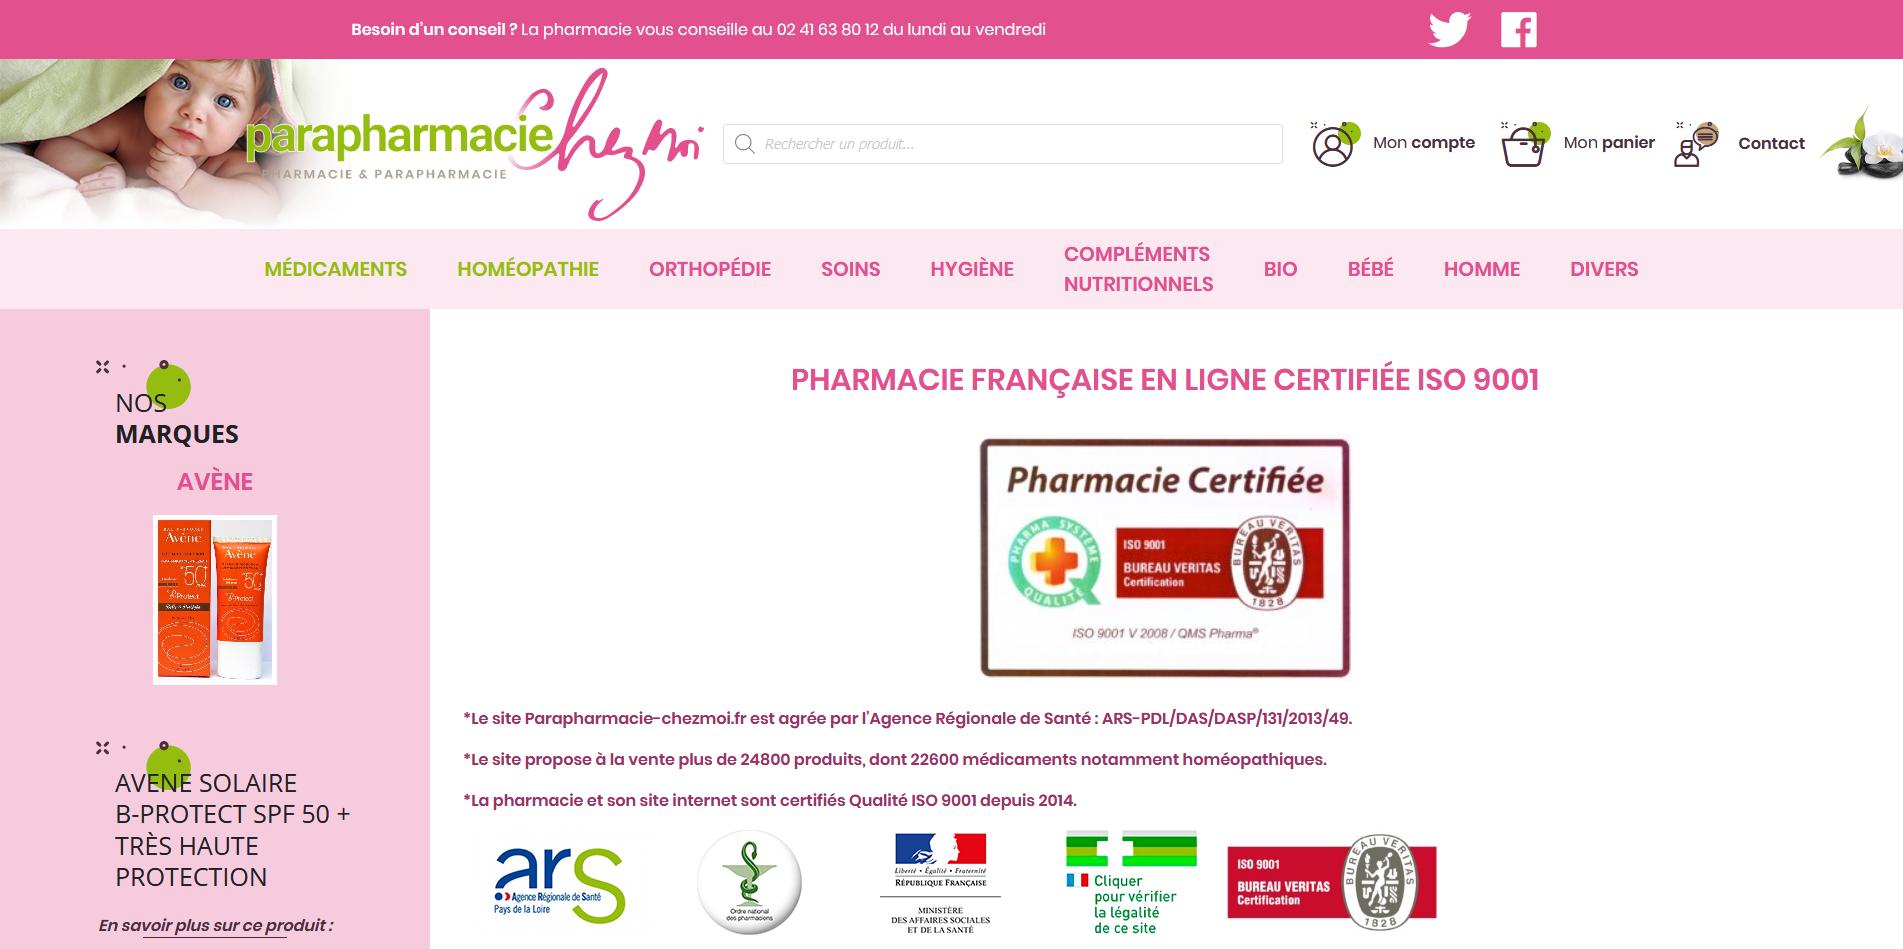 (c) Parapharmacie-chezmoi.fr